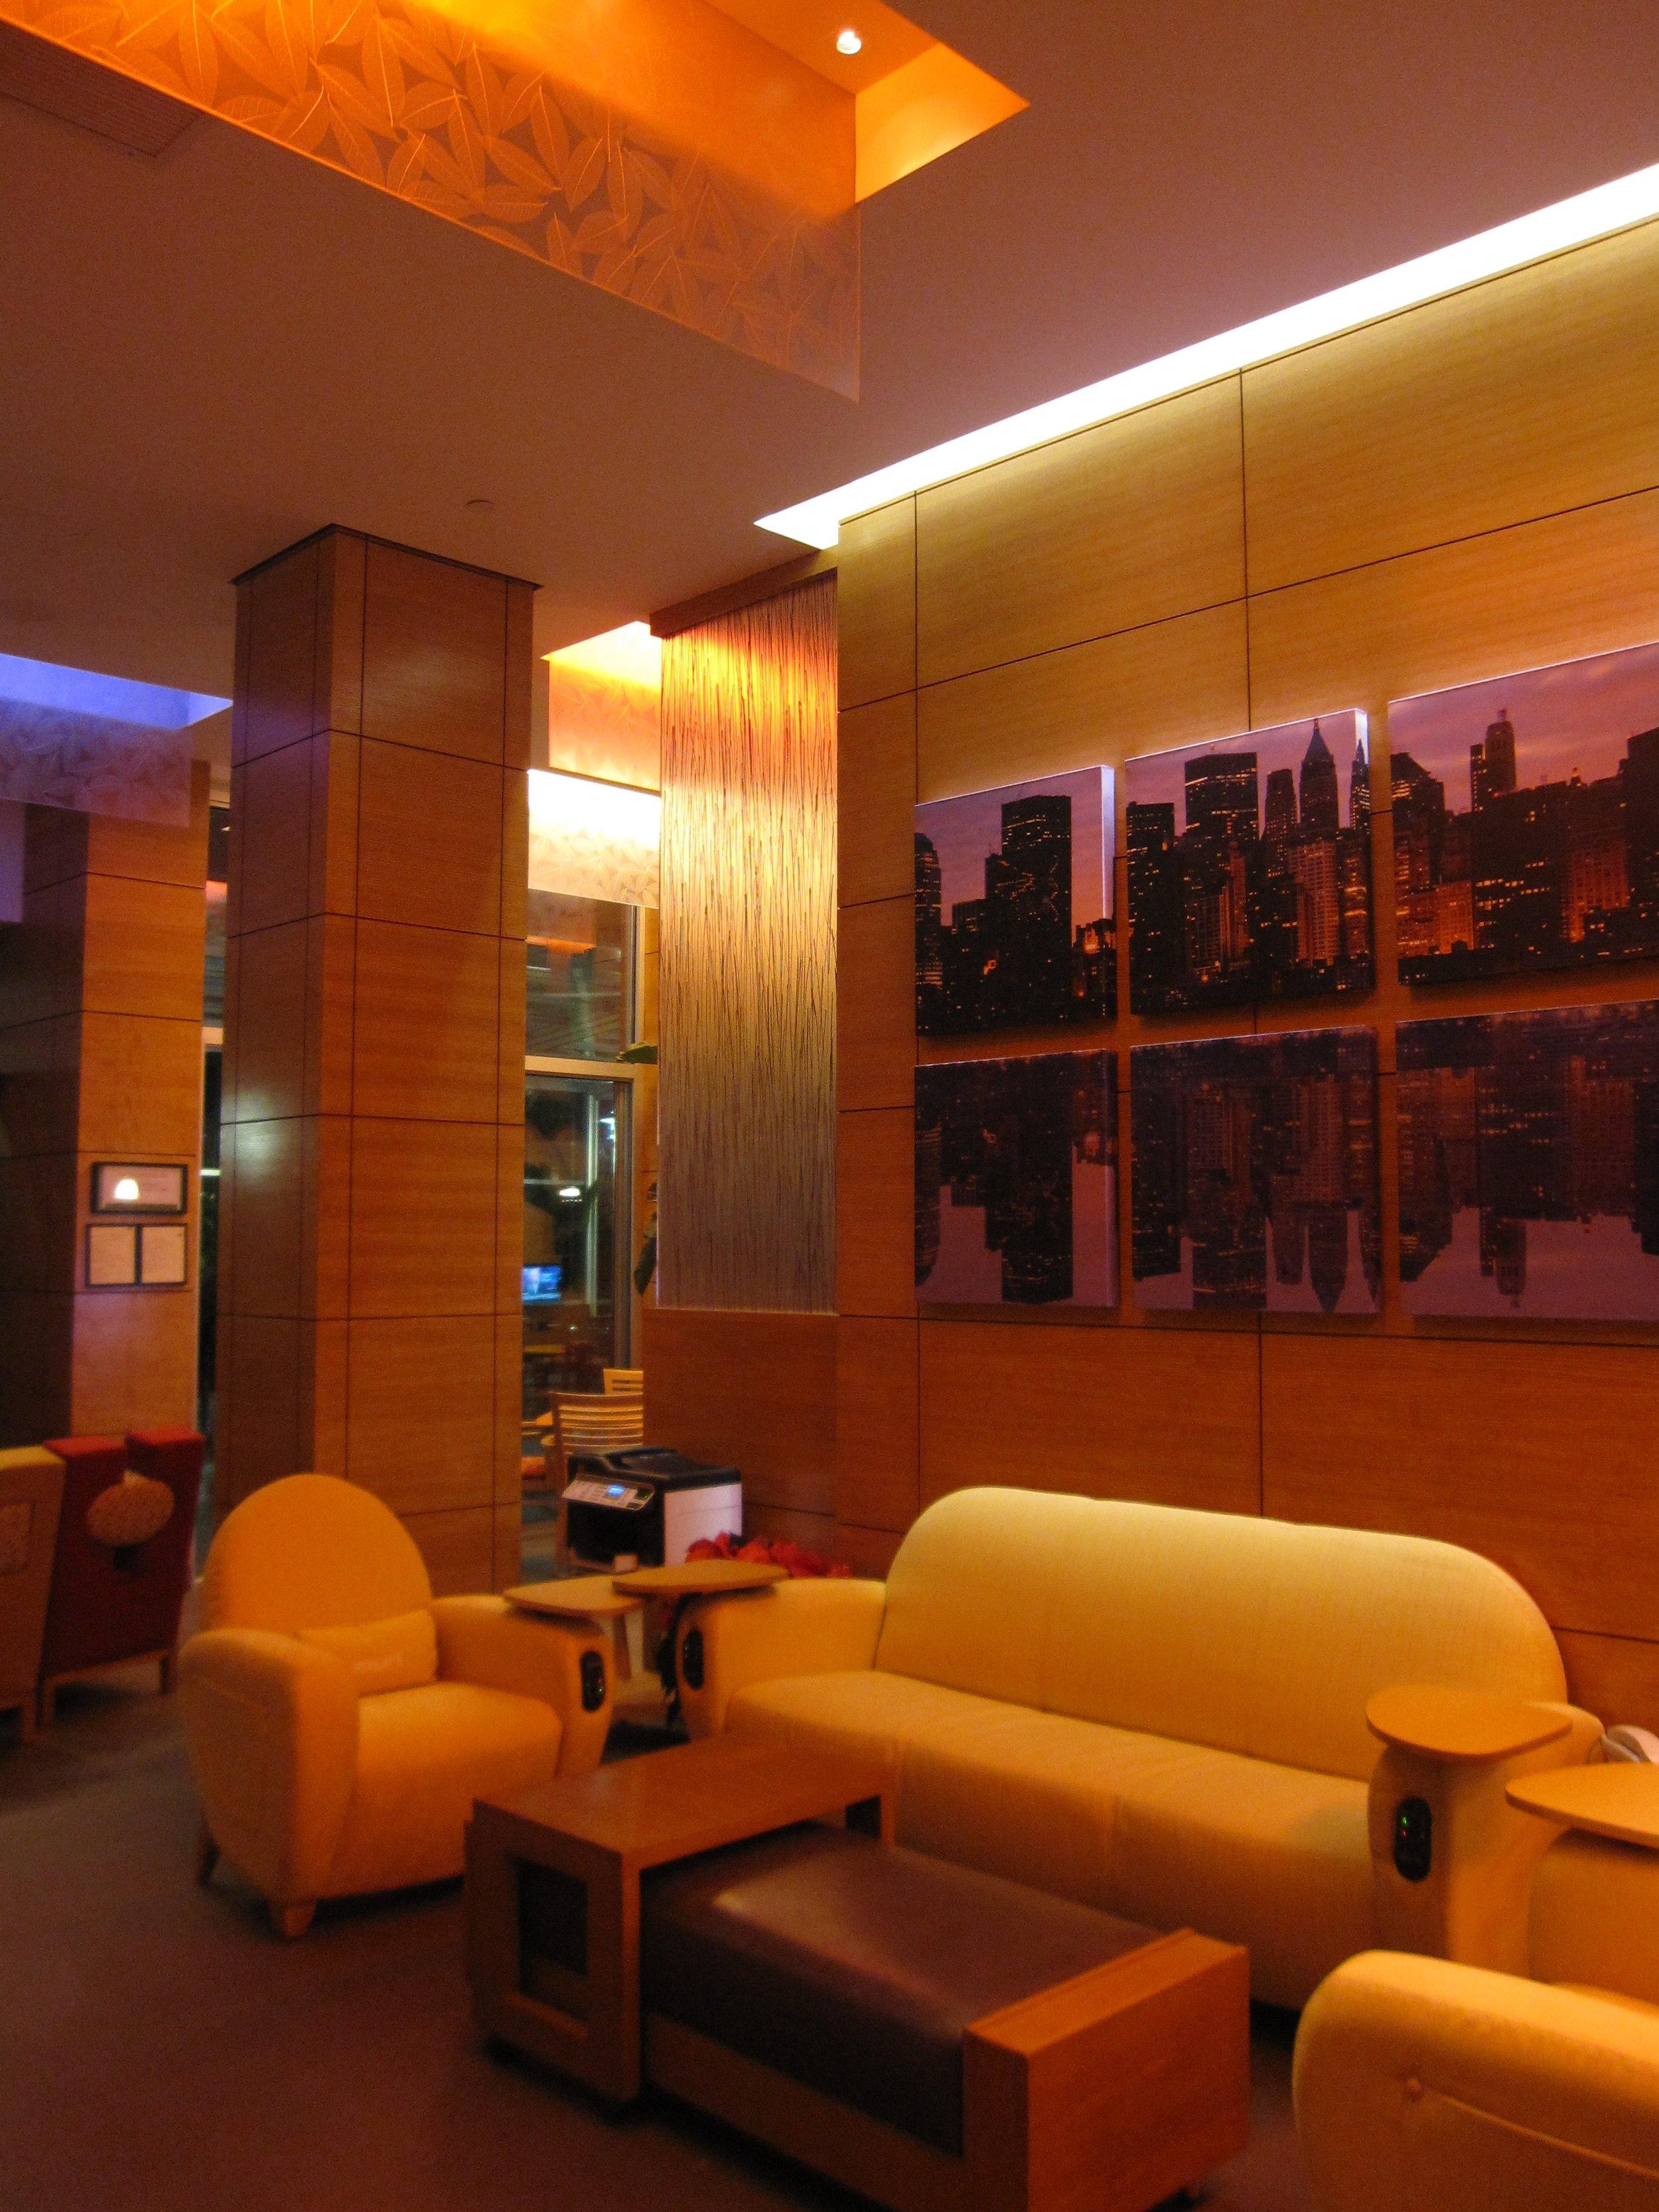 WYNDHAM GARDEN HOTEL – 36TH STREET, NYC